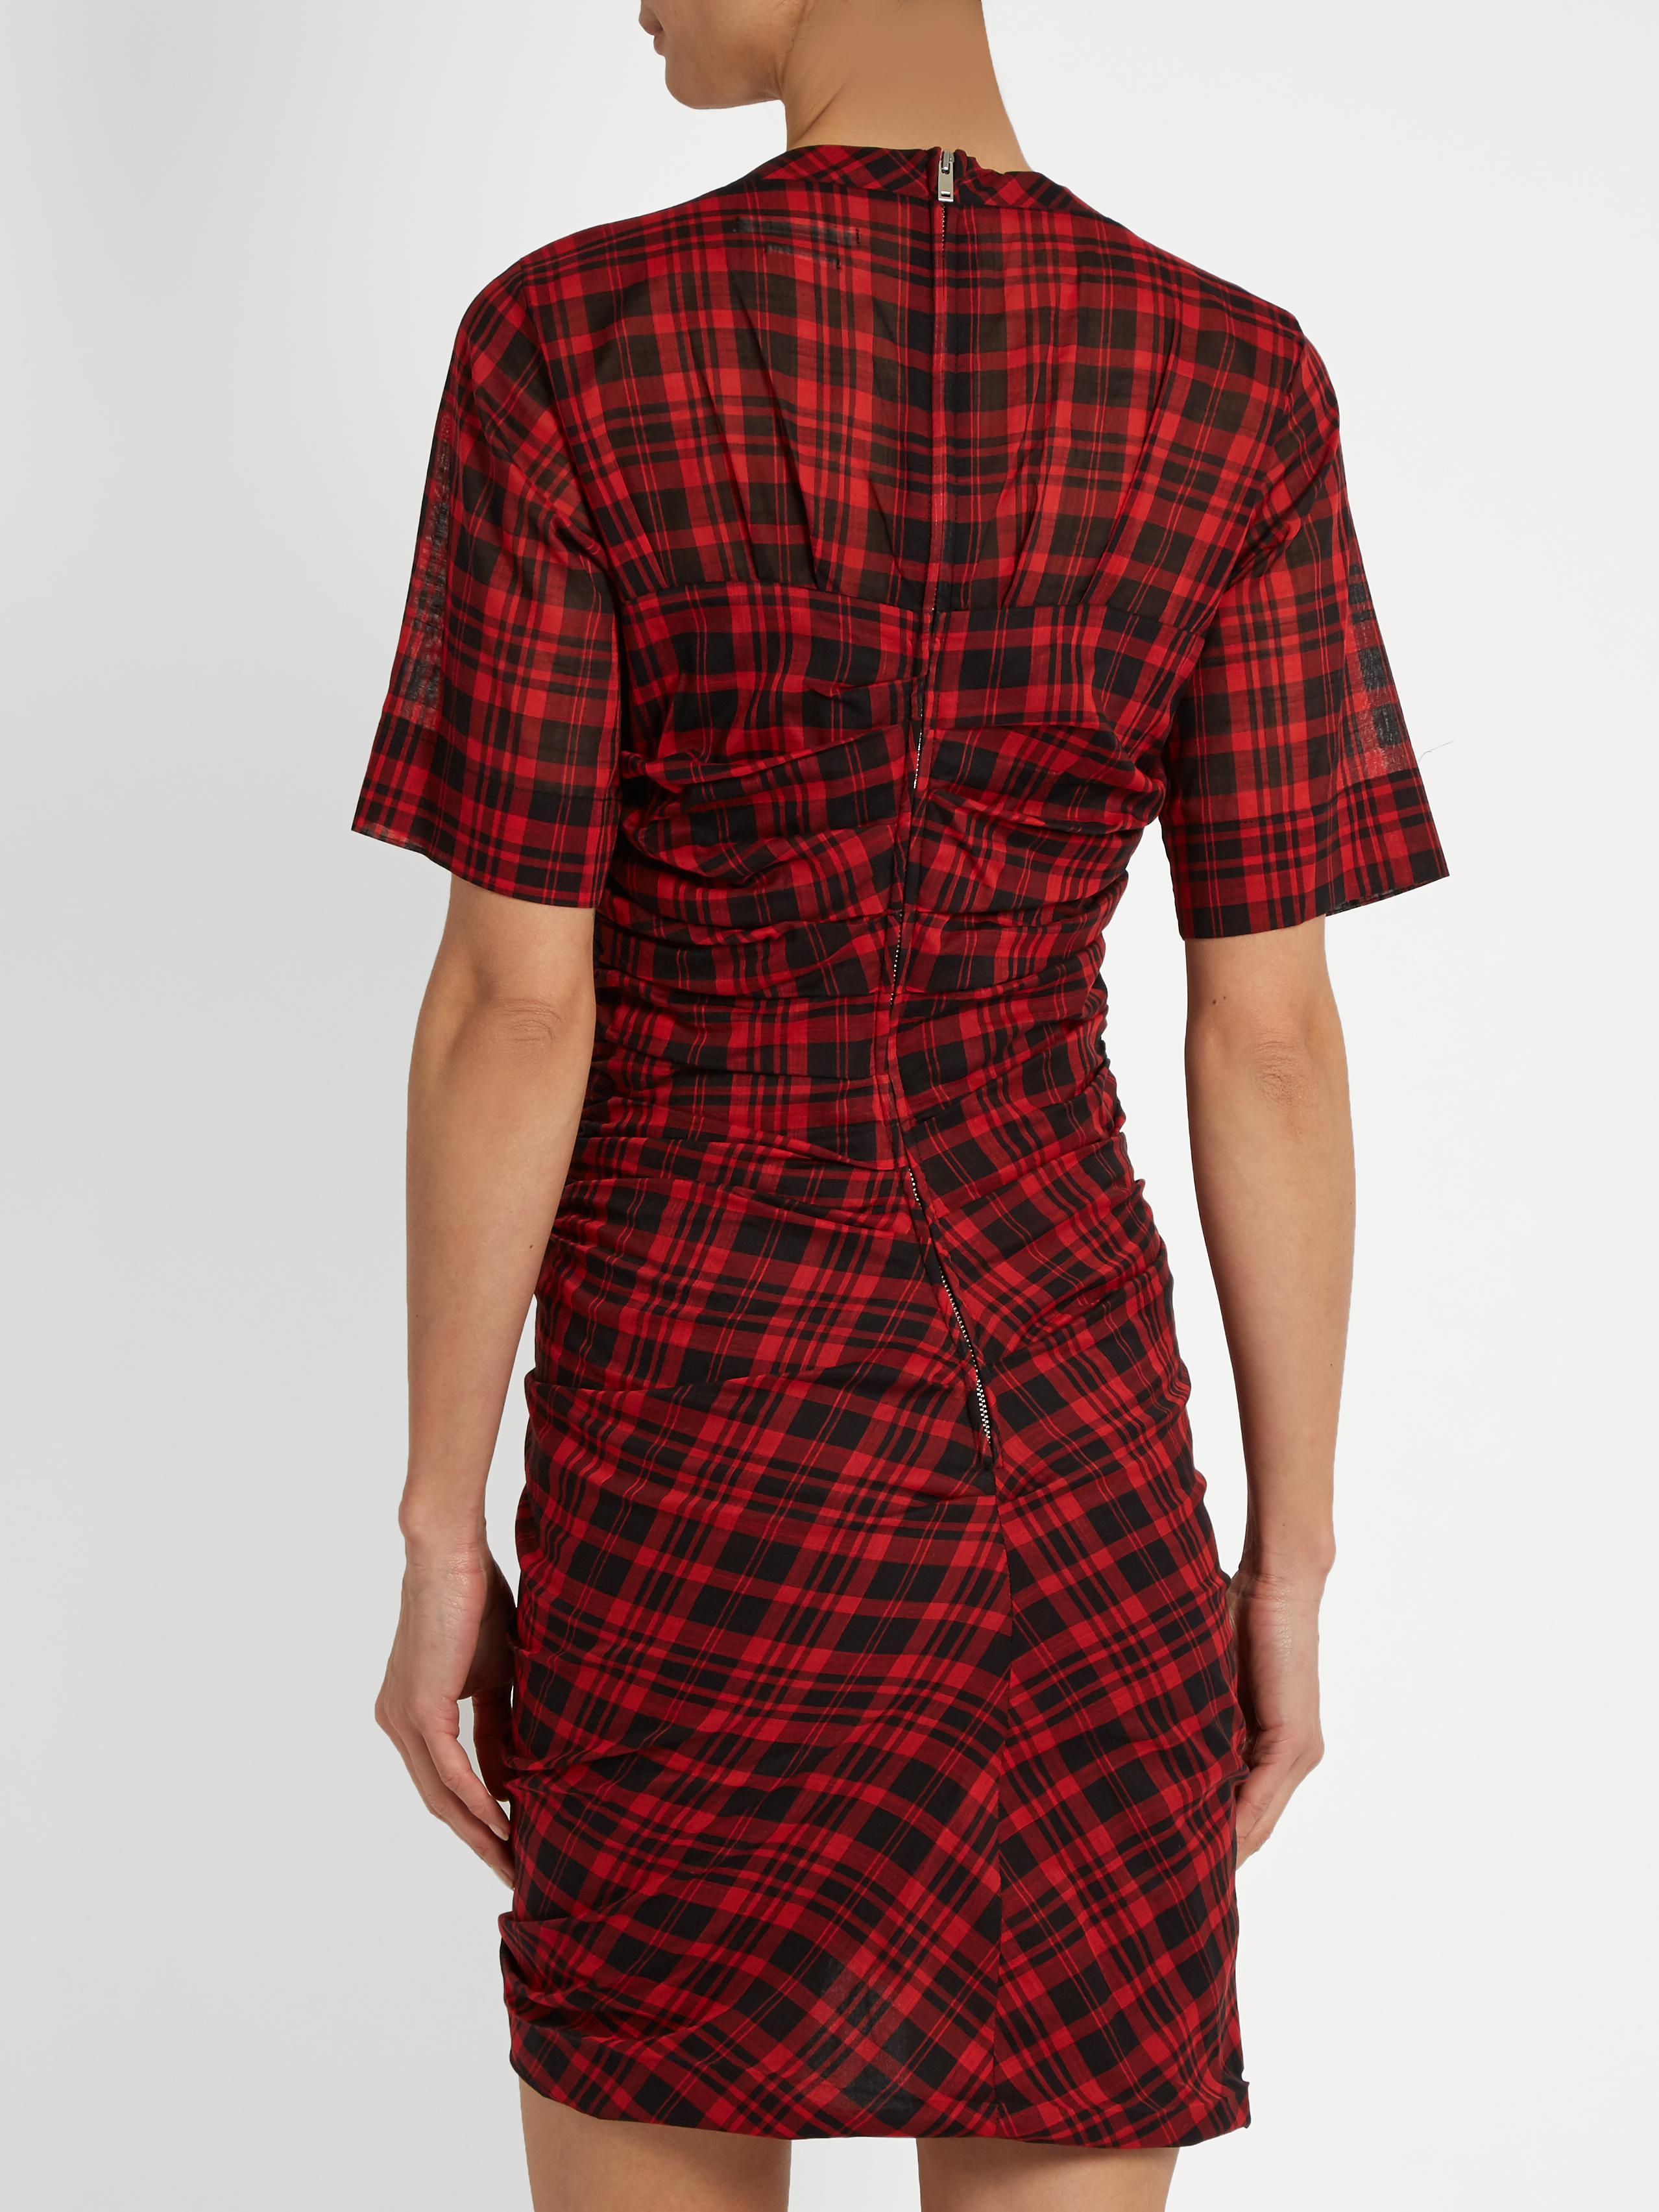 Order Footlocker Cheap Price Étoile Isabel Marant Plaid Mini Dress Manchester Great Sale xJKb4Aj4